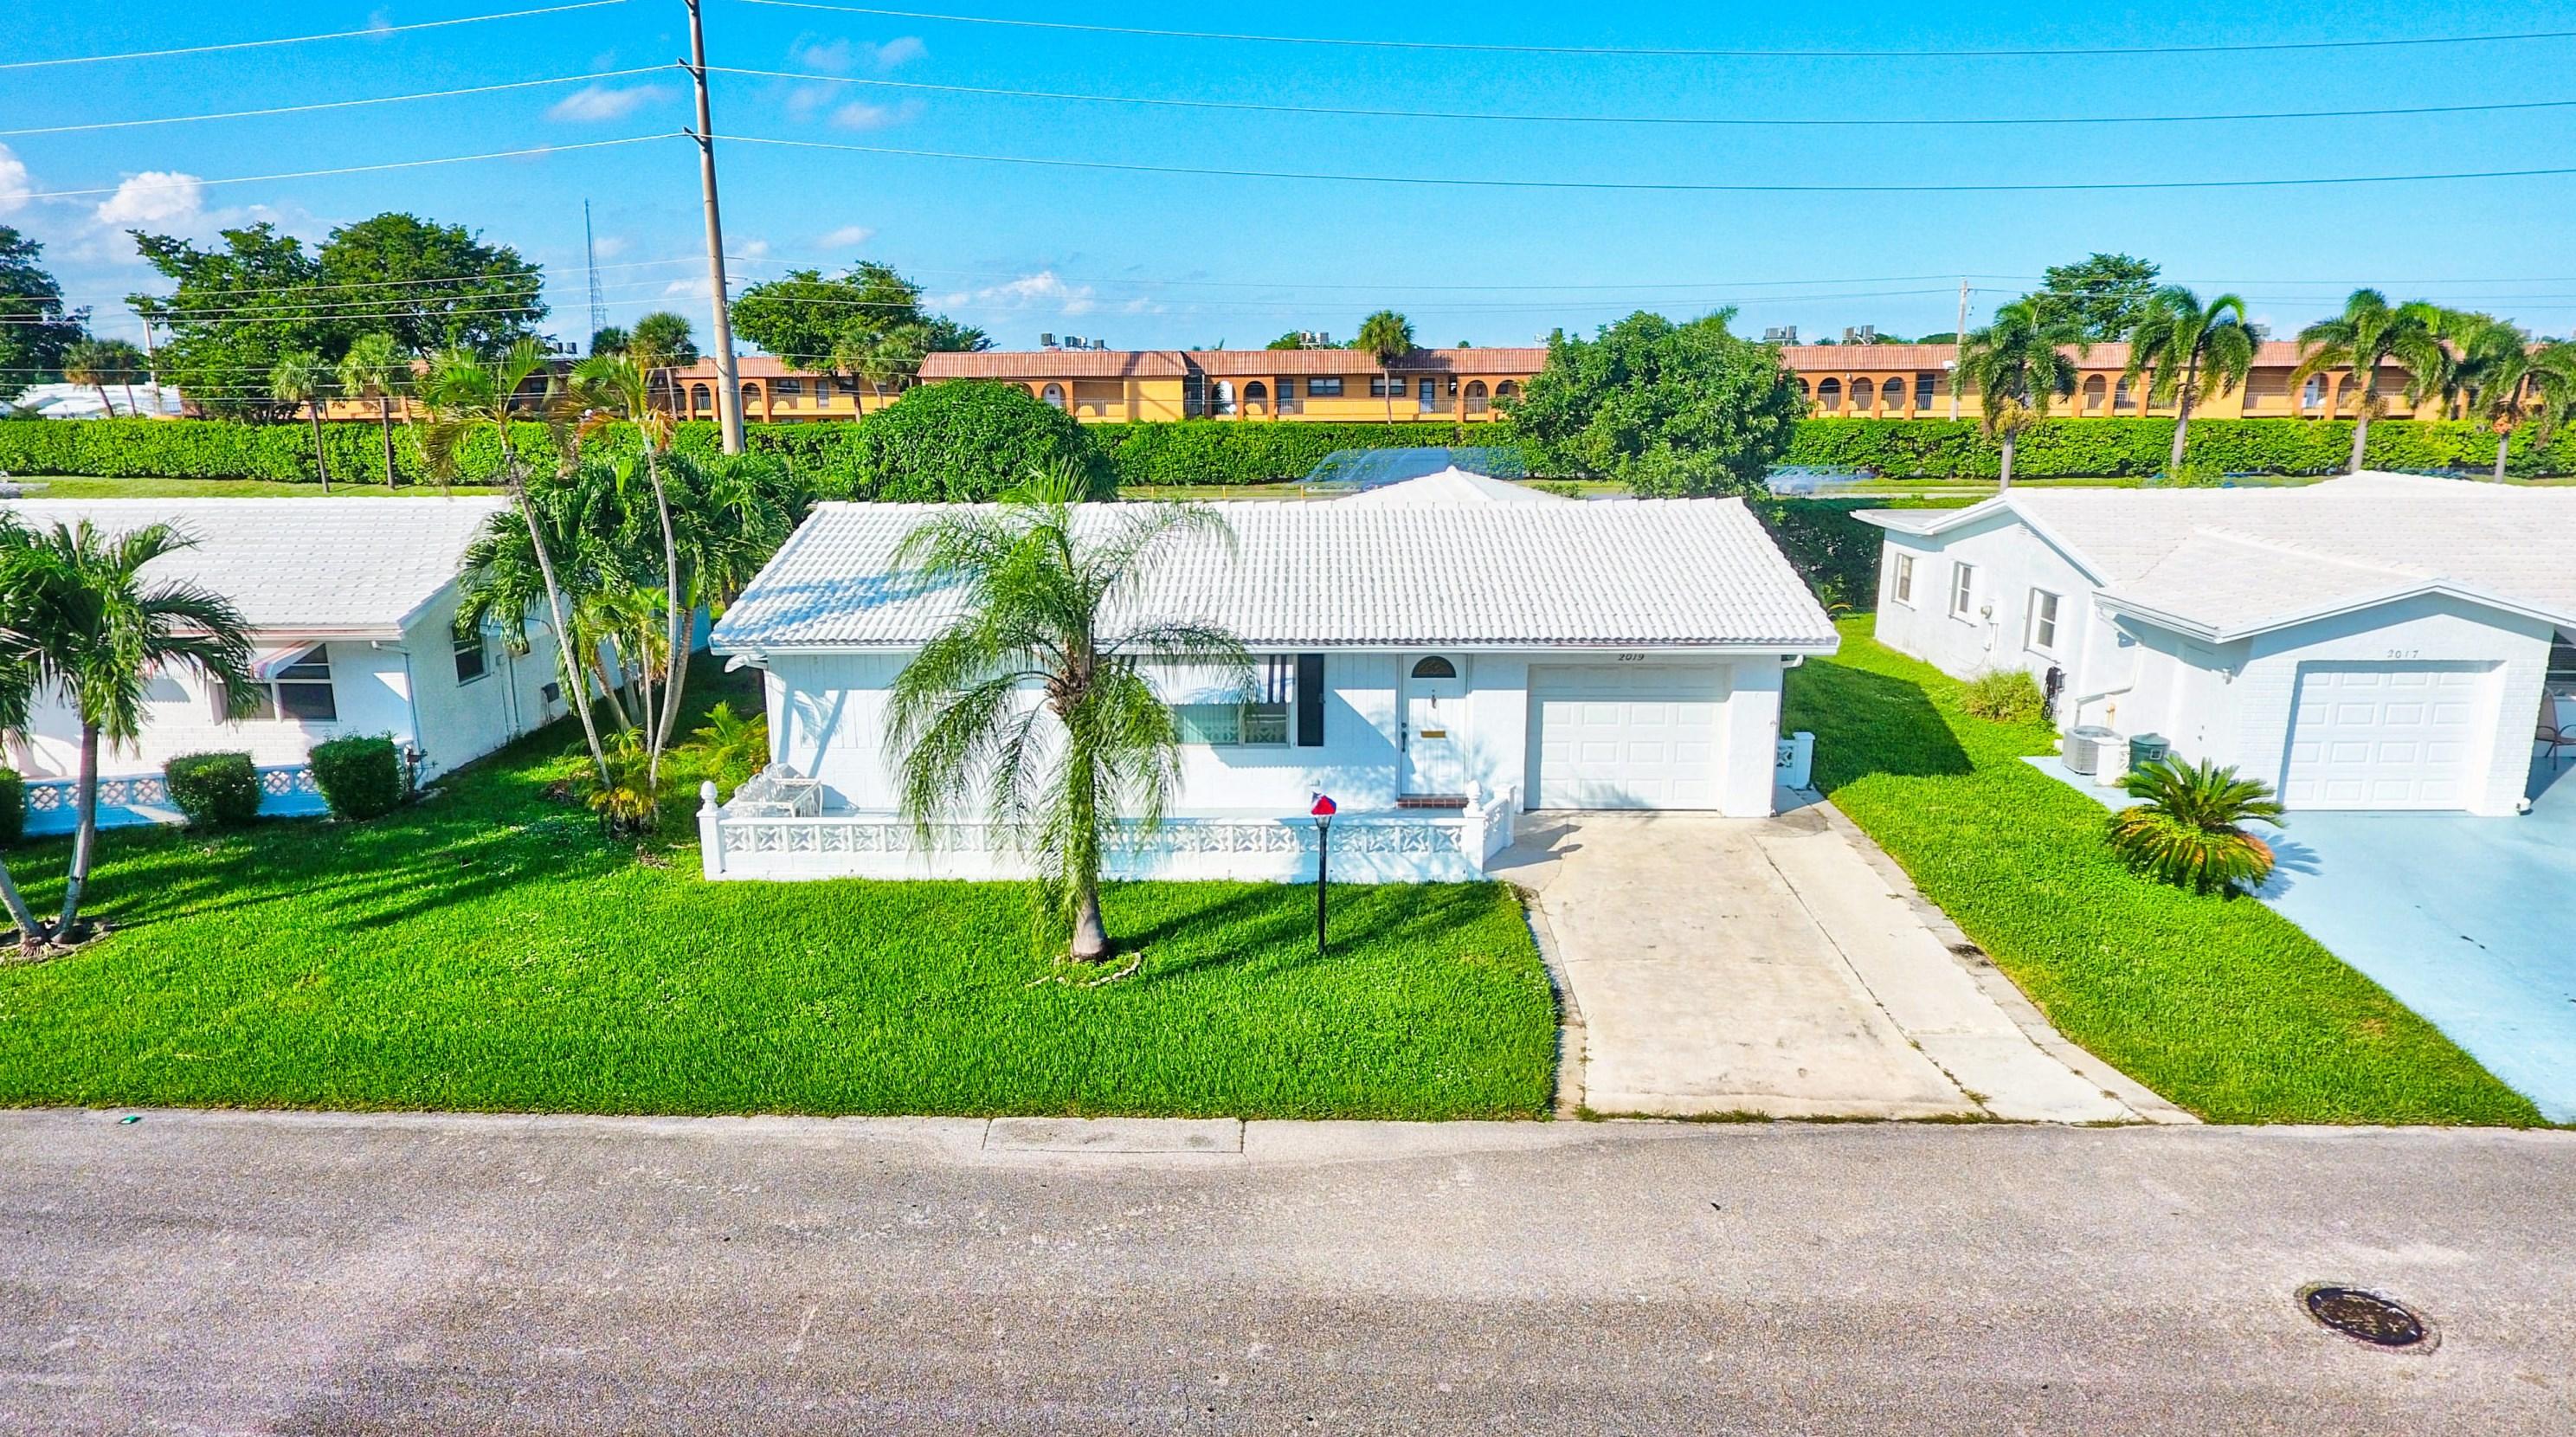 2019 Sw 16th Ave, Boynton Beach, FL 33426